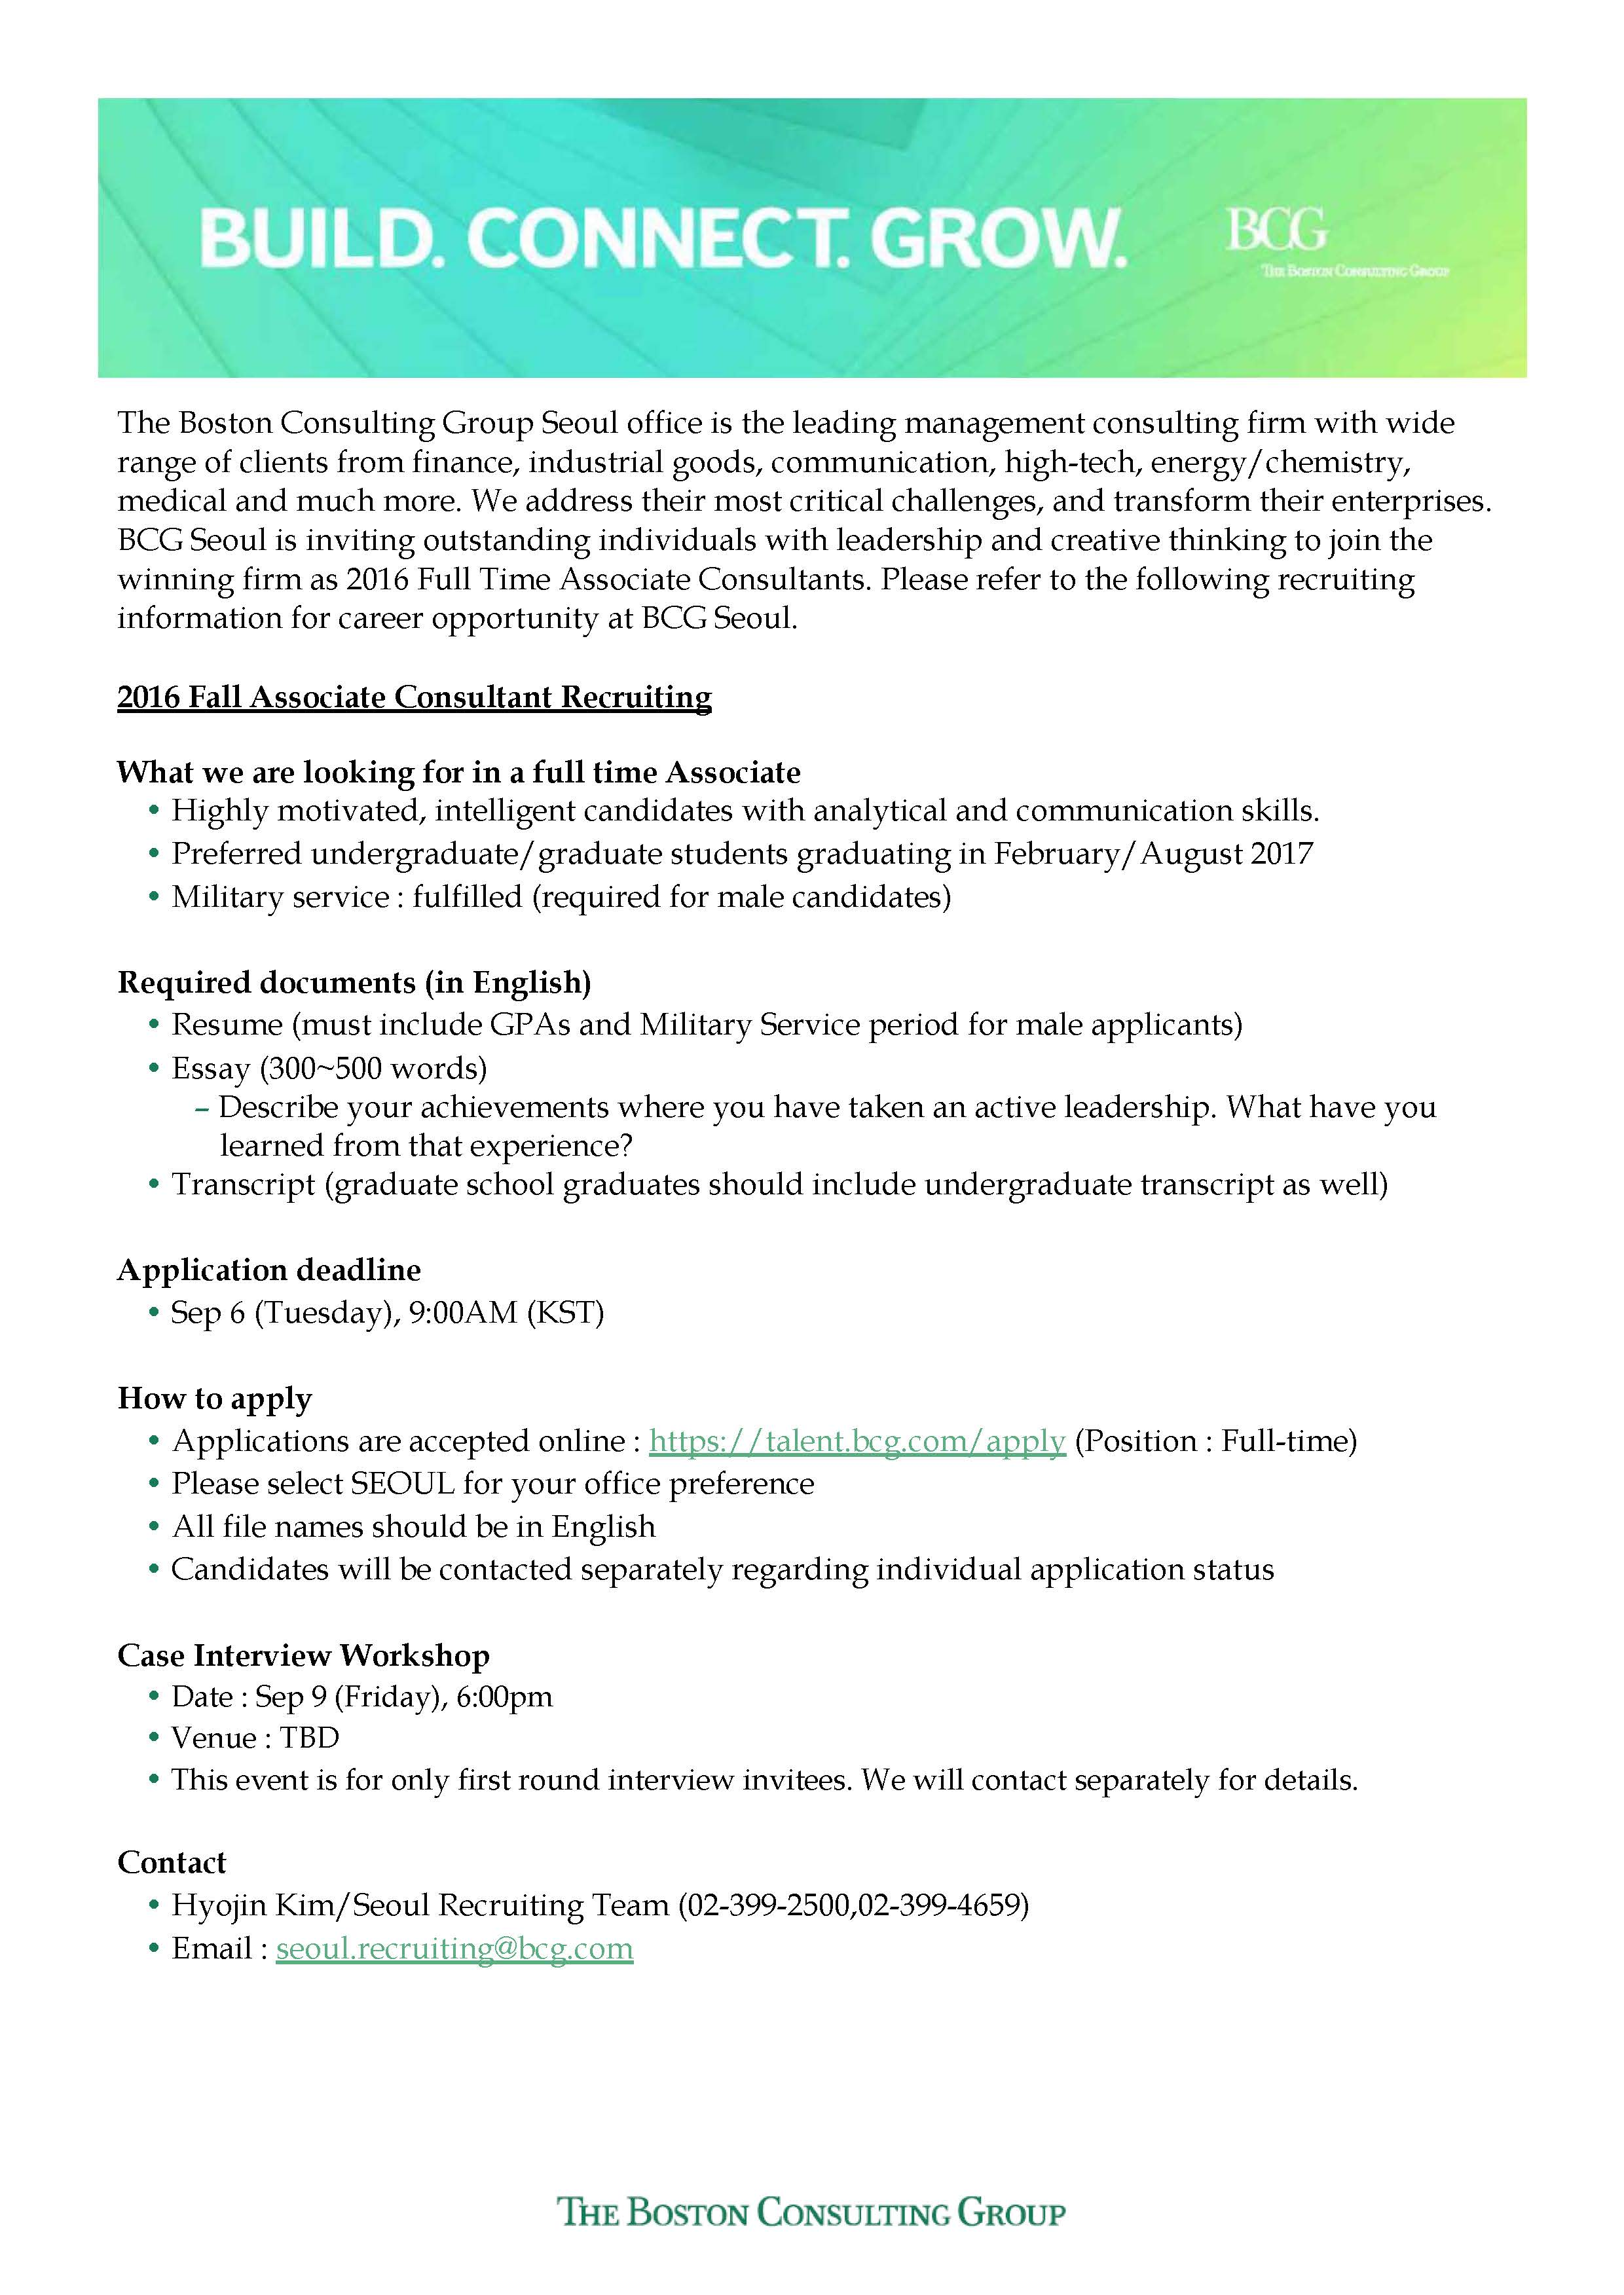 BCG SEO_2016 Fall Associate recruiting_페이지_1.jpg